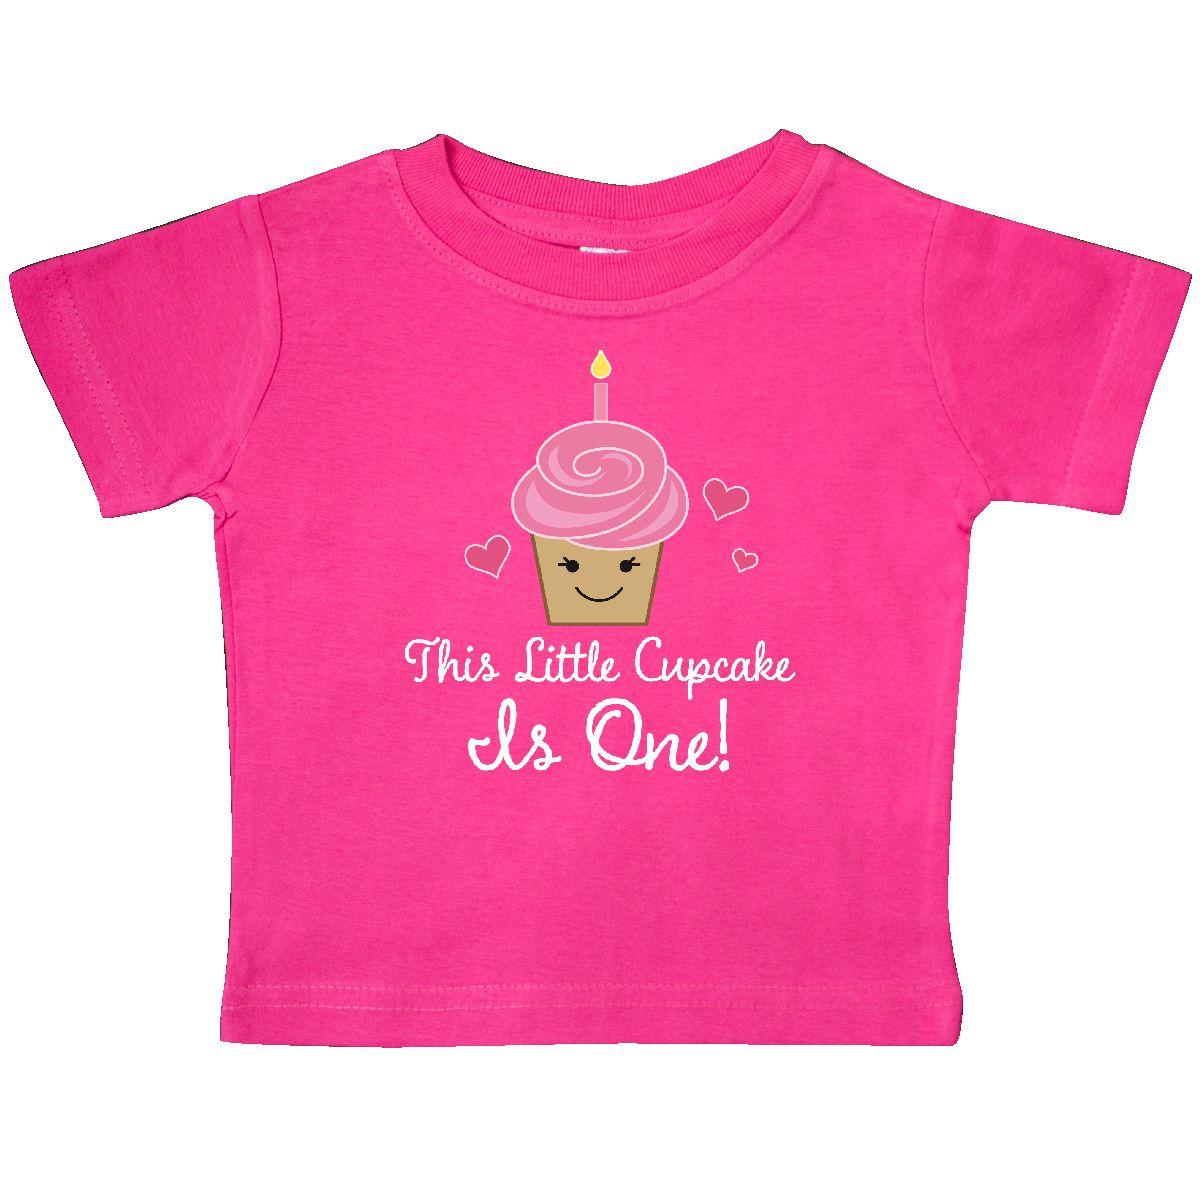 2b8c849857ffb Inktastic 1st Birthday Cupcake Girls Cute Baby T-Shirt First One ...